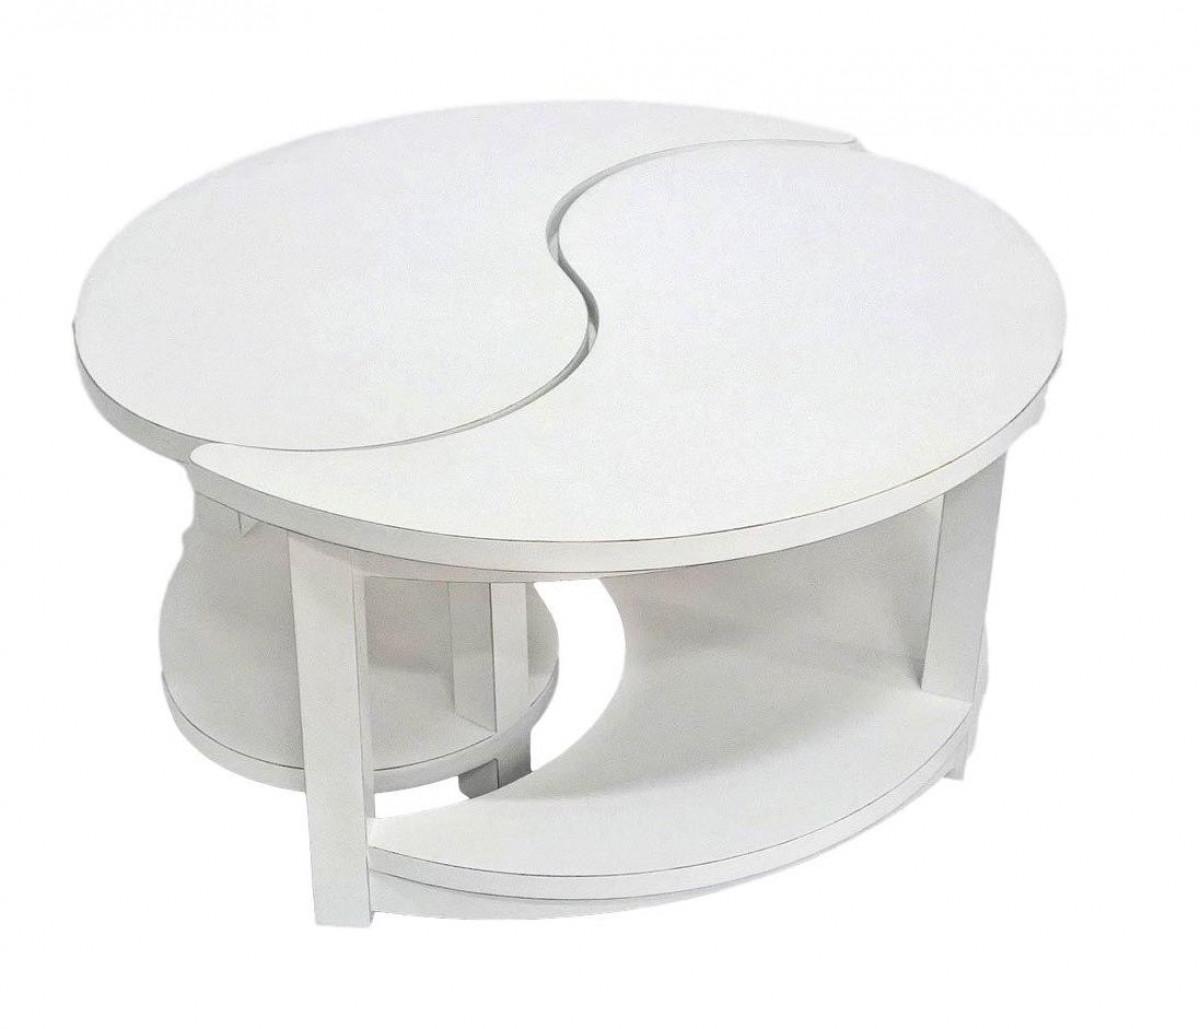 table basse ronde 2 elements jorg